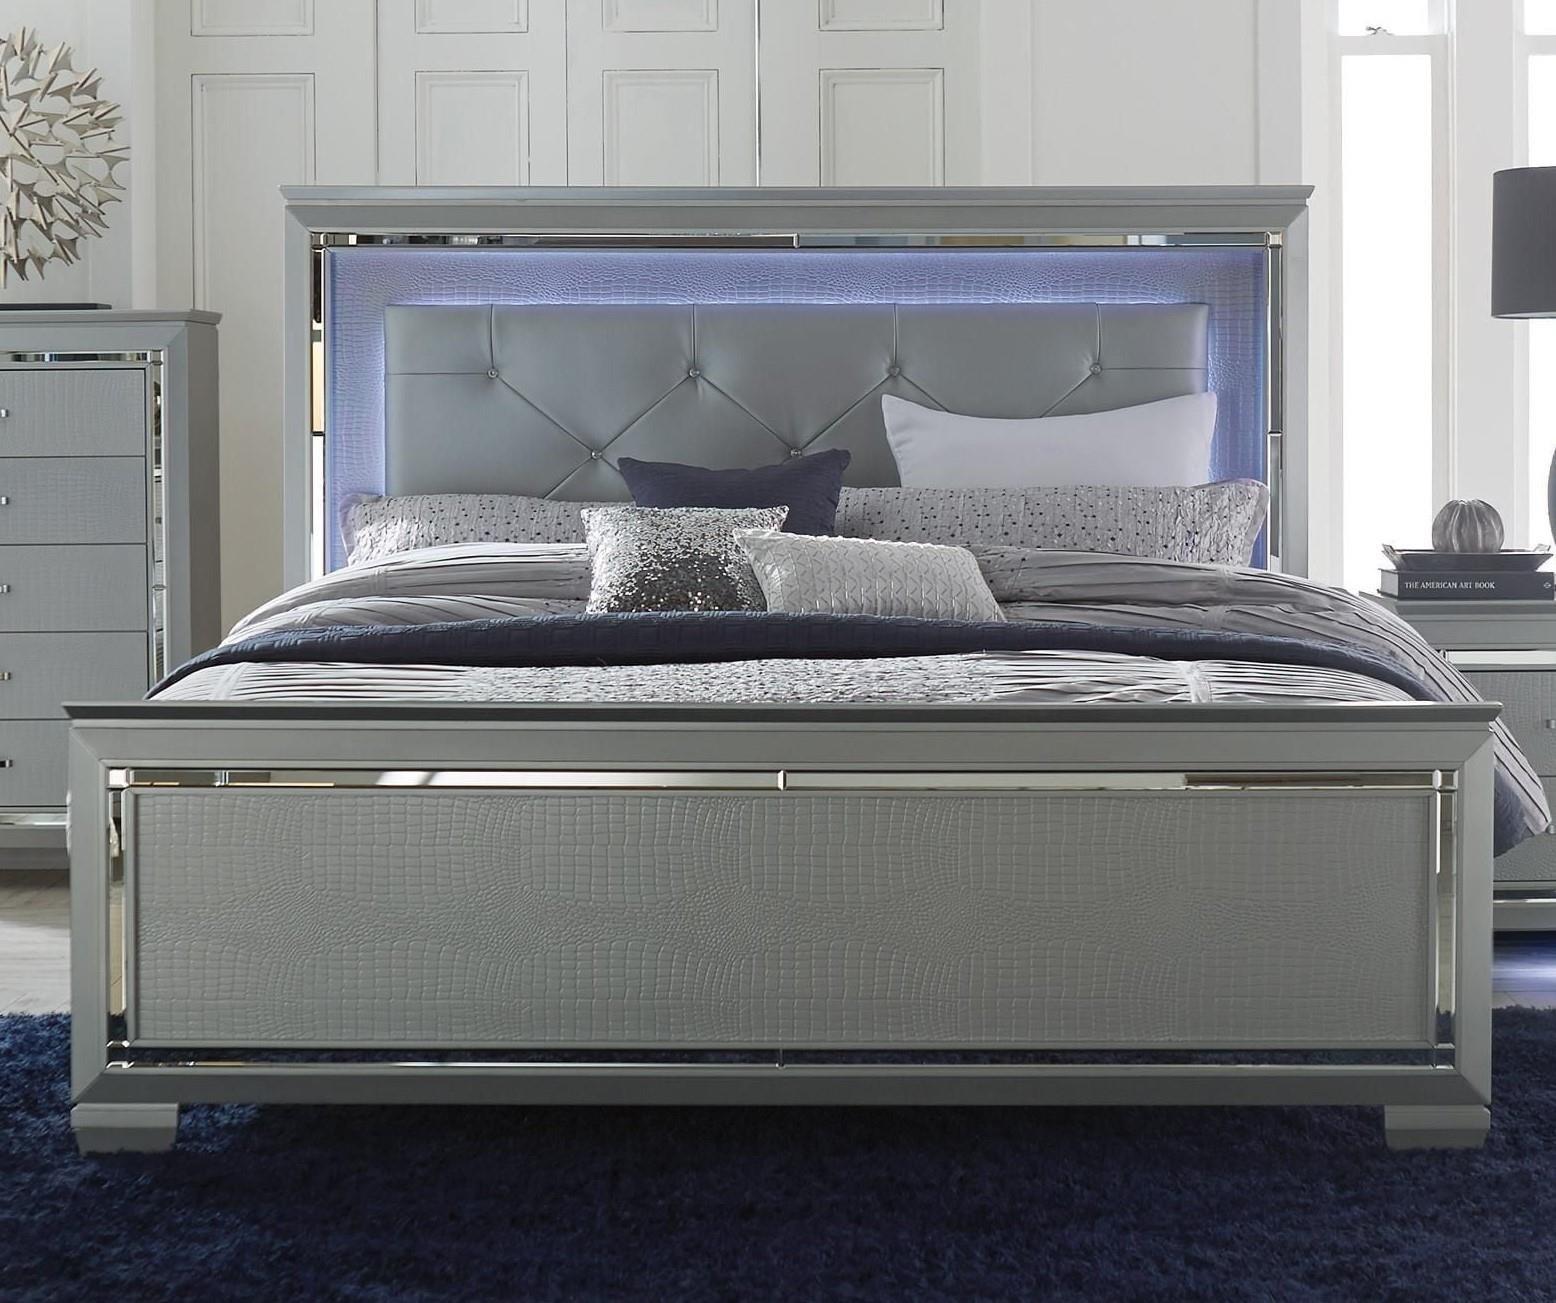 1916SV King Panel Bed by Homelegance at Furniture Fair - North Carolina